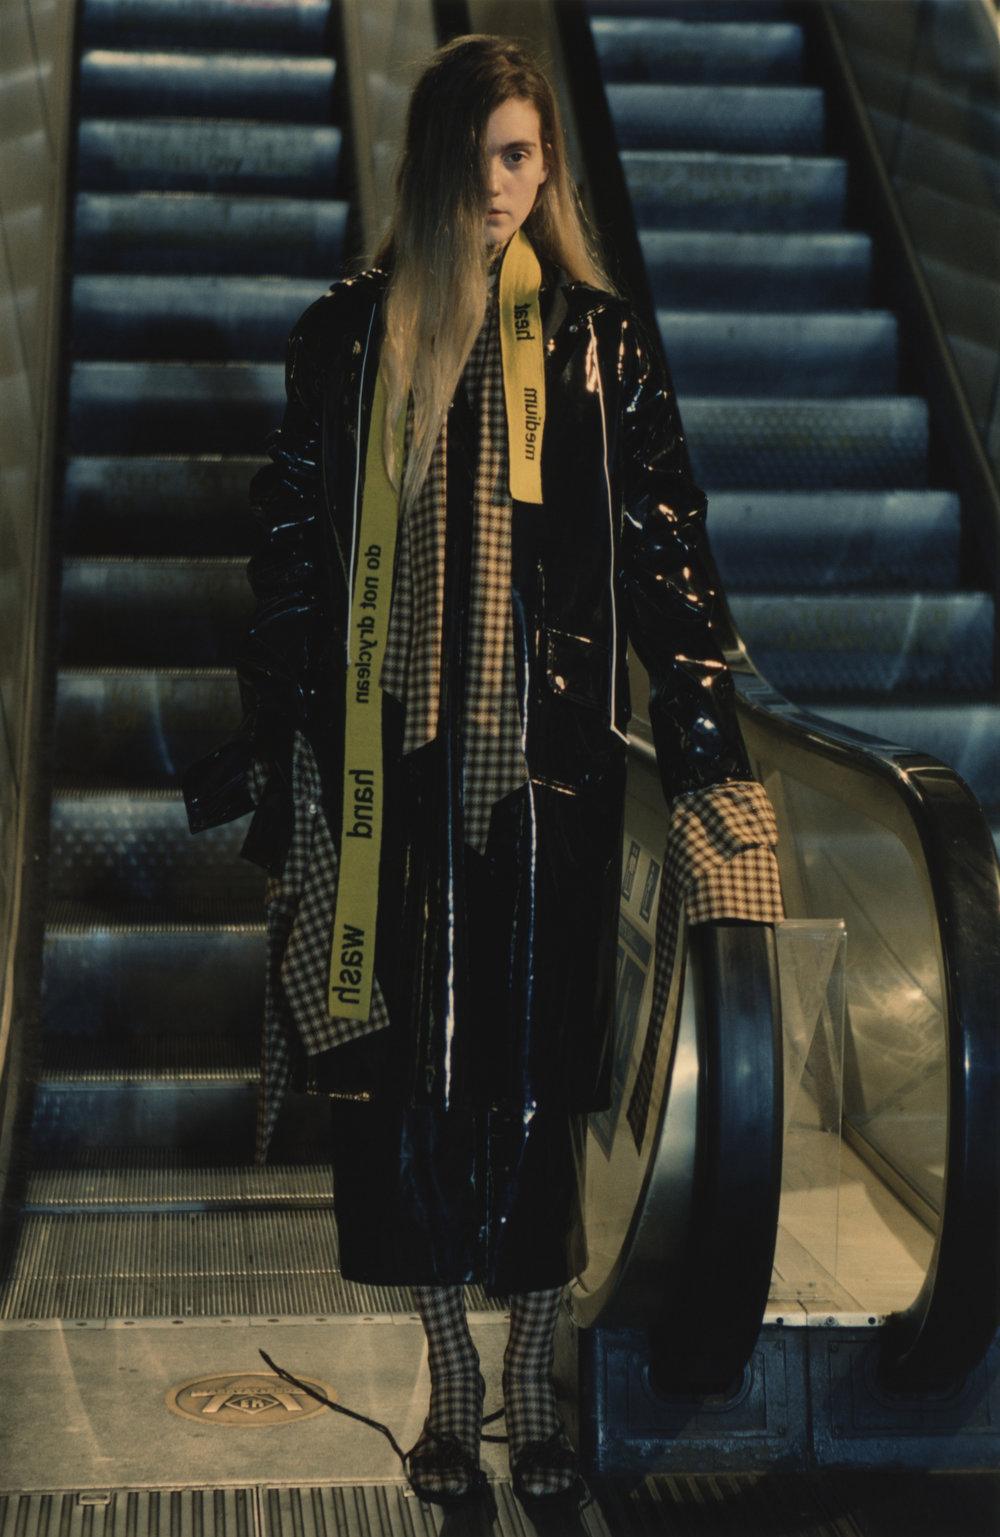 rokh_aw18_fashion_collection_magazine_vogue_12.jpg